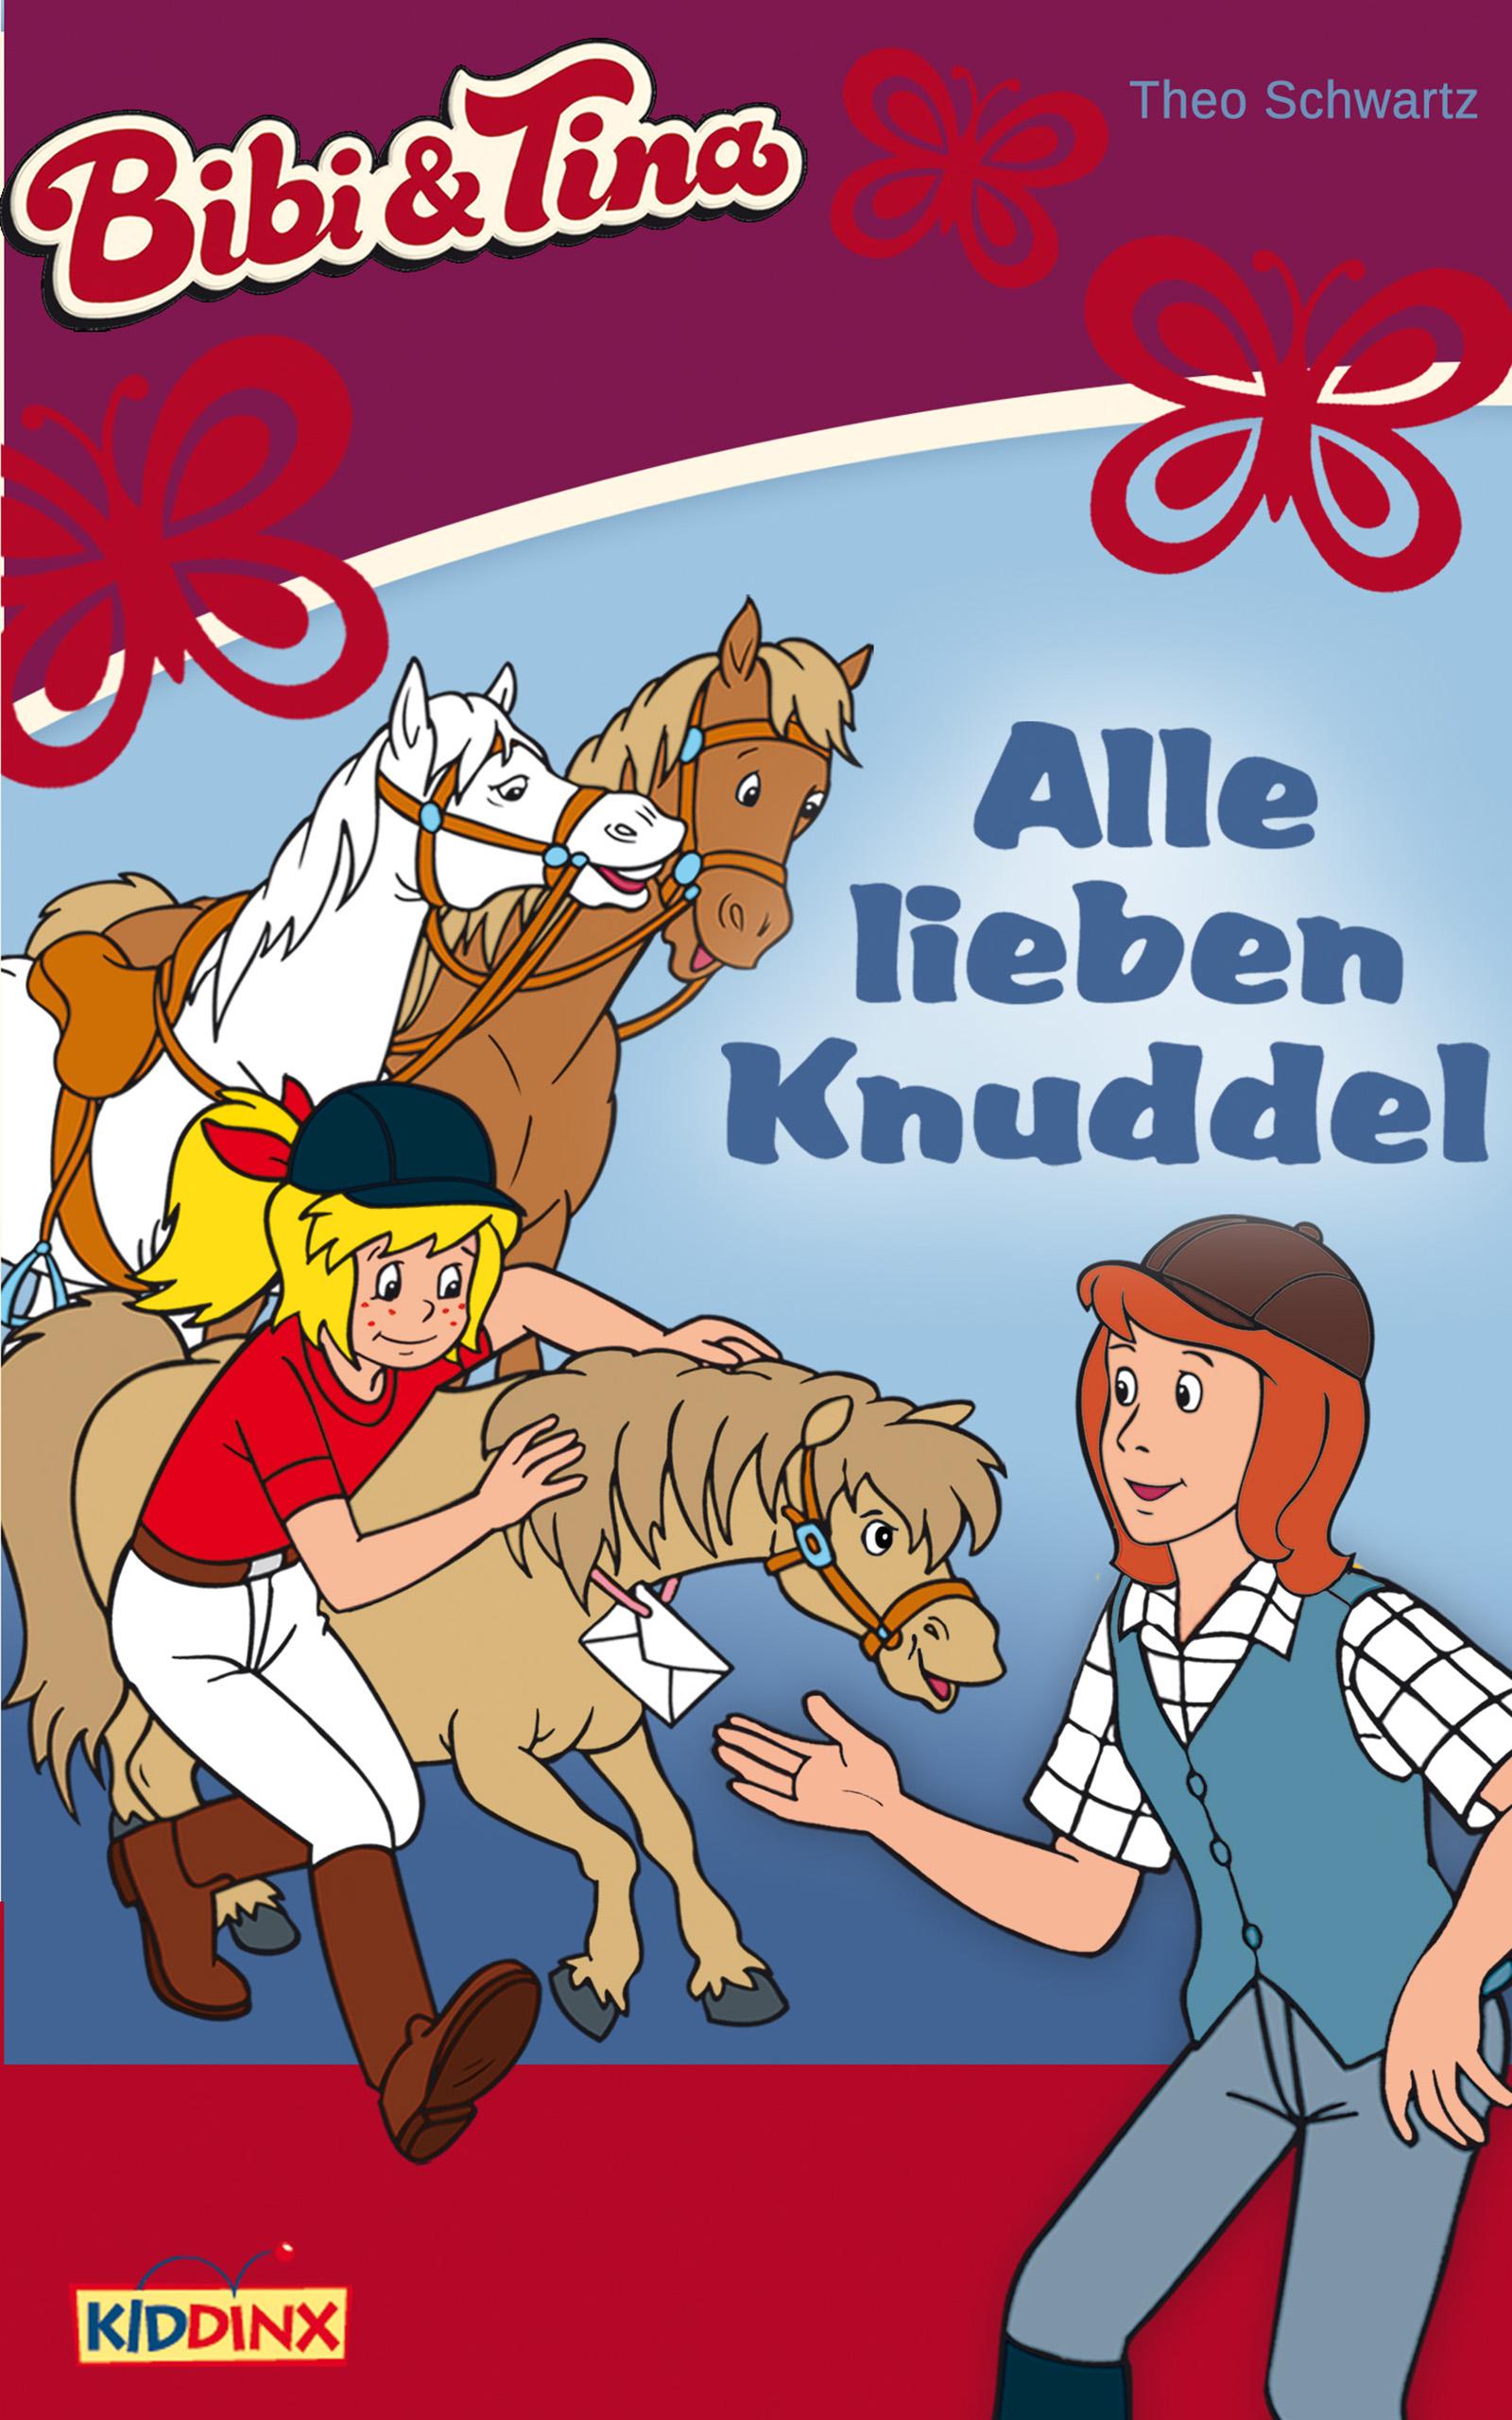 Bibi & Tina: Alle lieben Knuddel (eBook/Kindle)